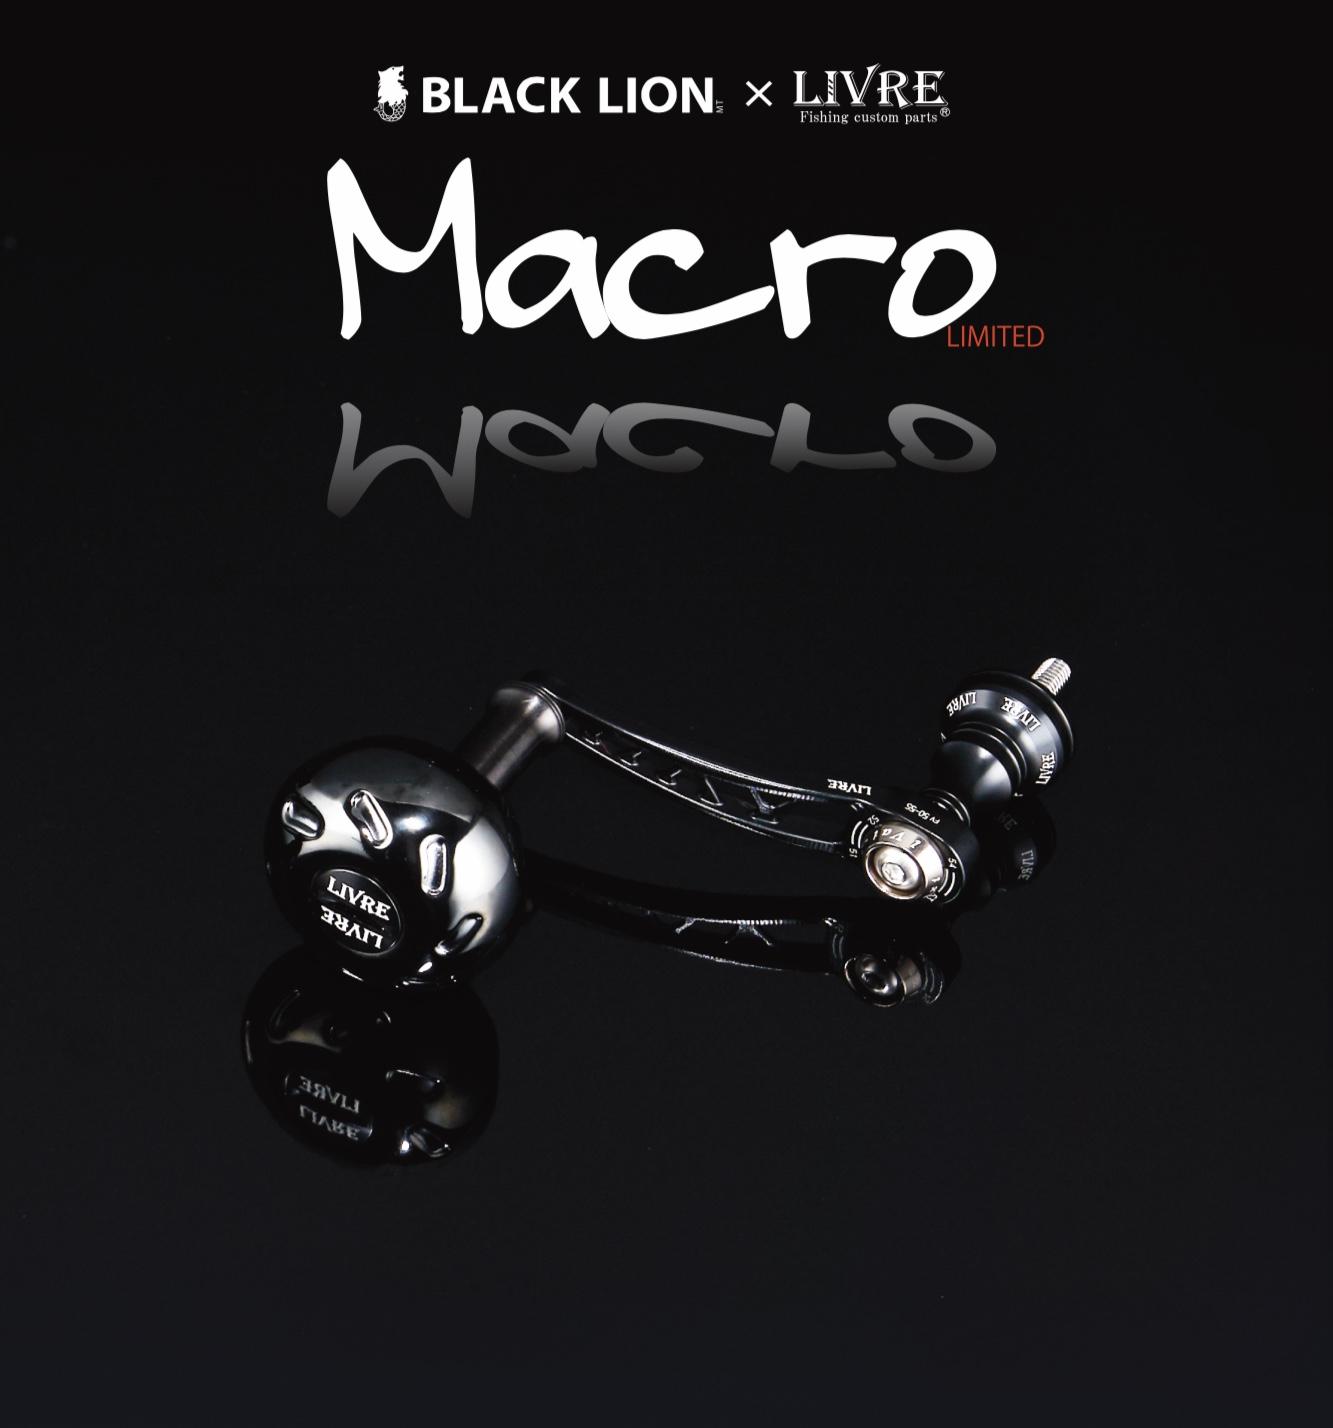 【 LIVRE × BLACKLION 】